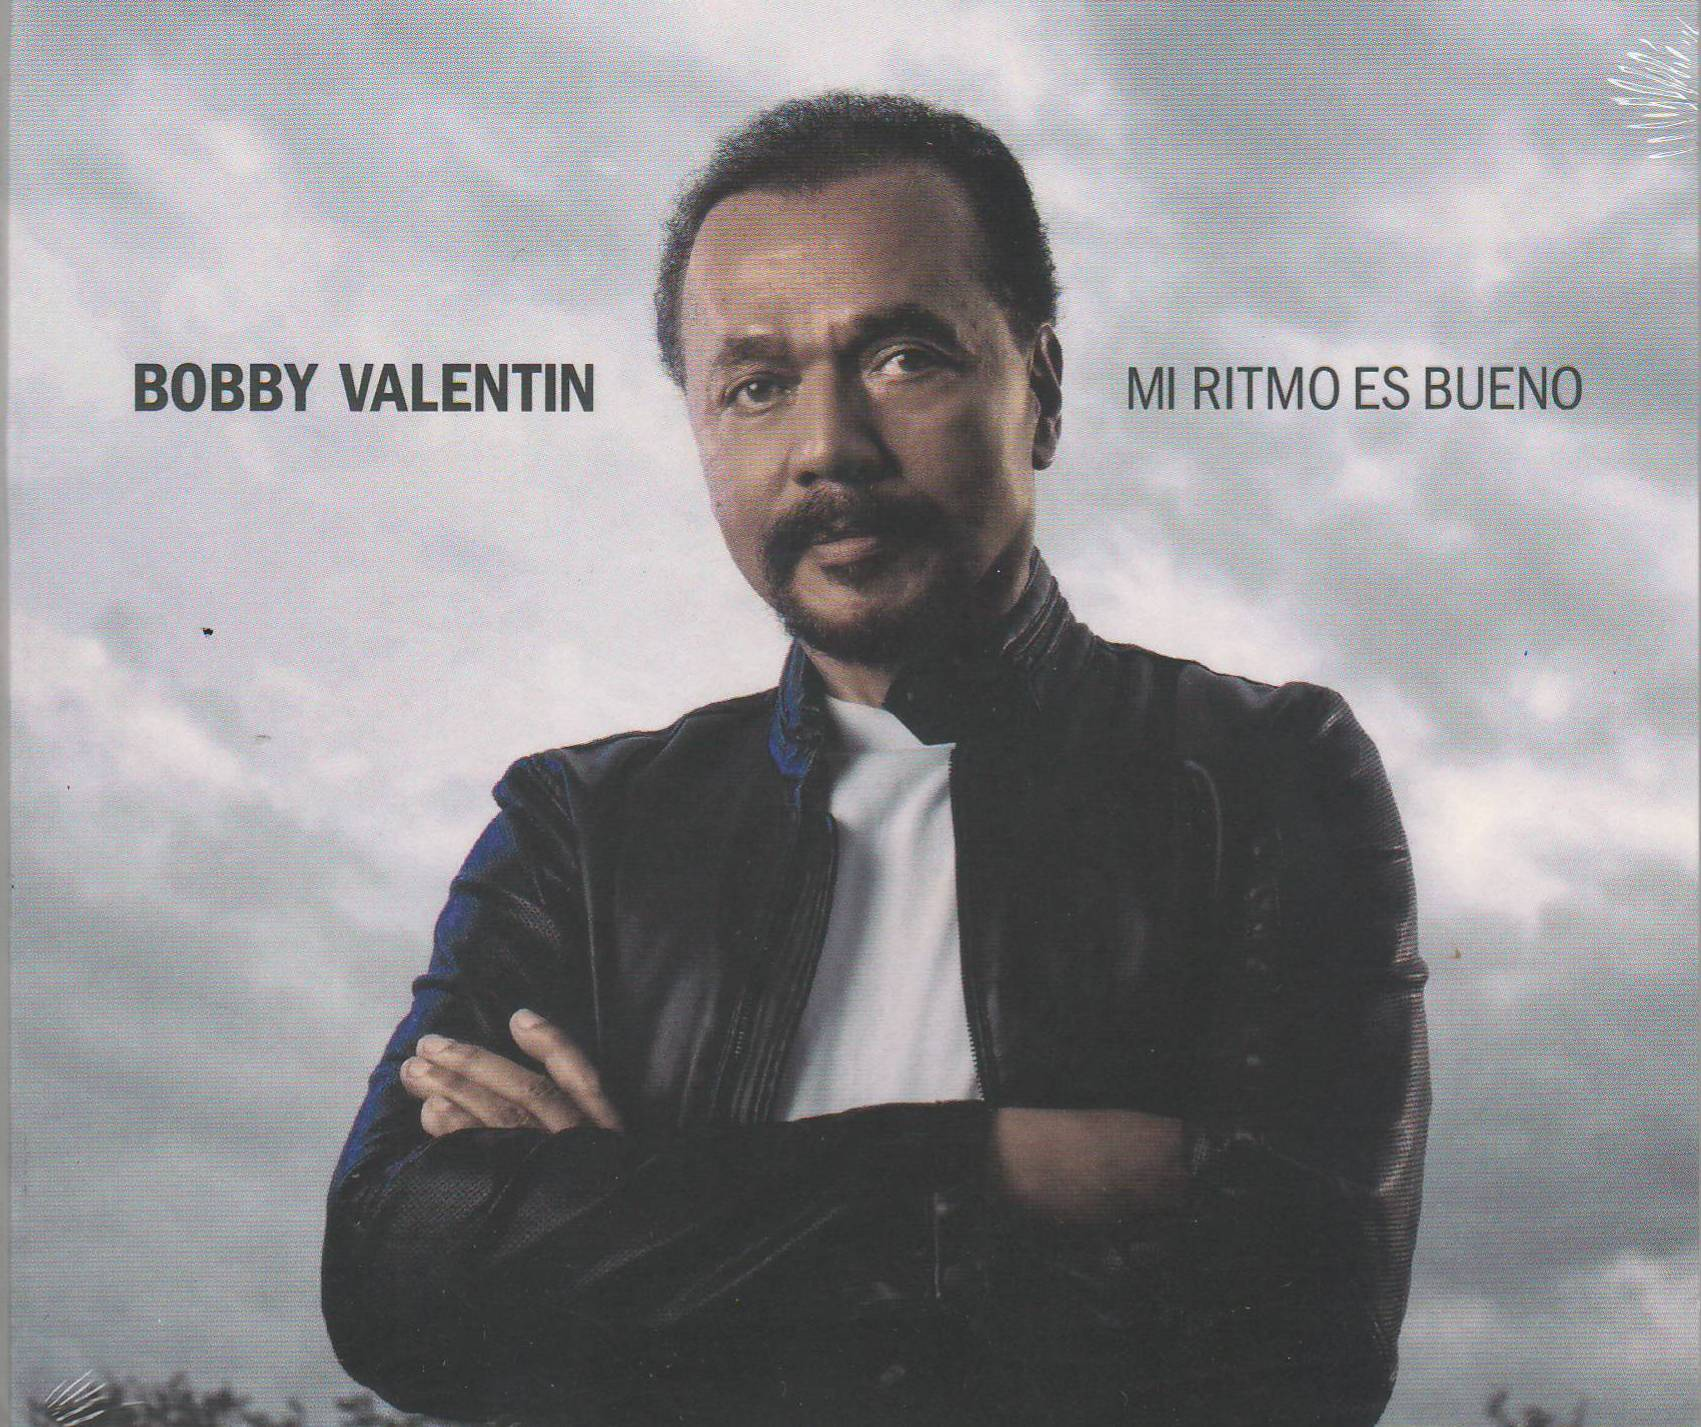 bobby valentin - 2016 - mi ritmo es bueno